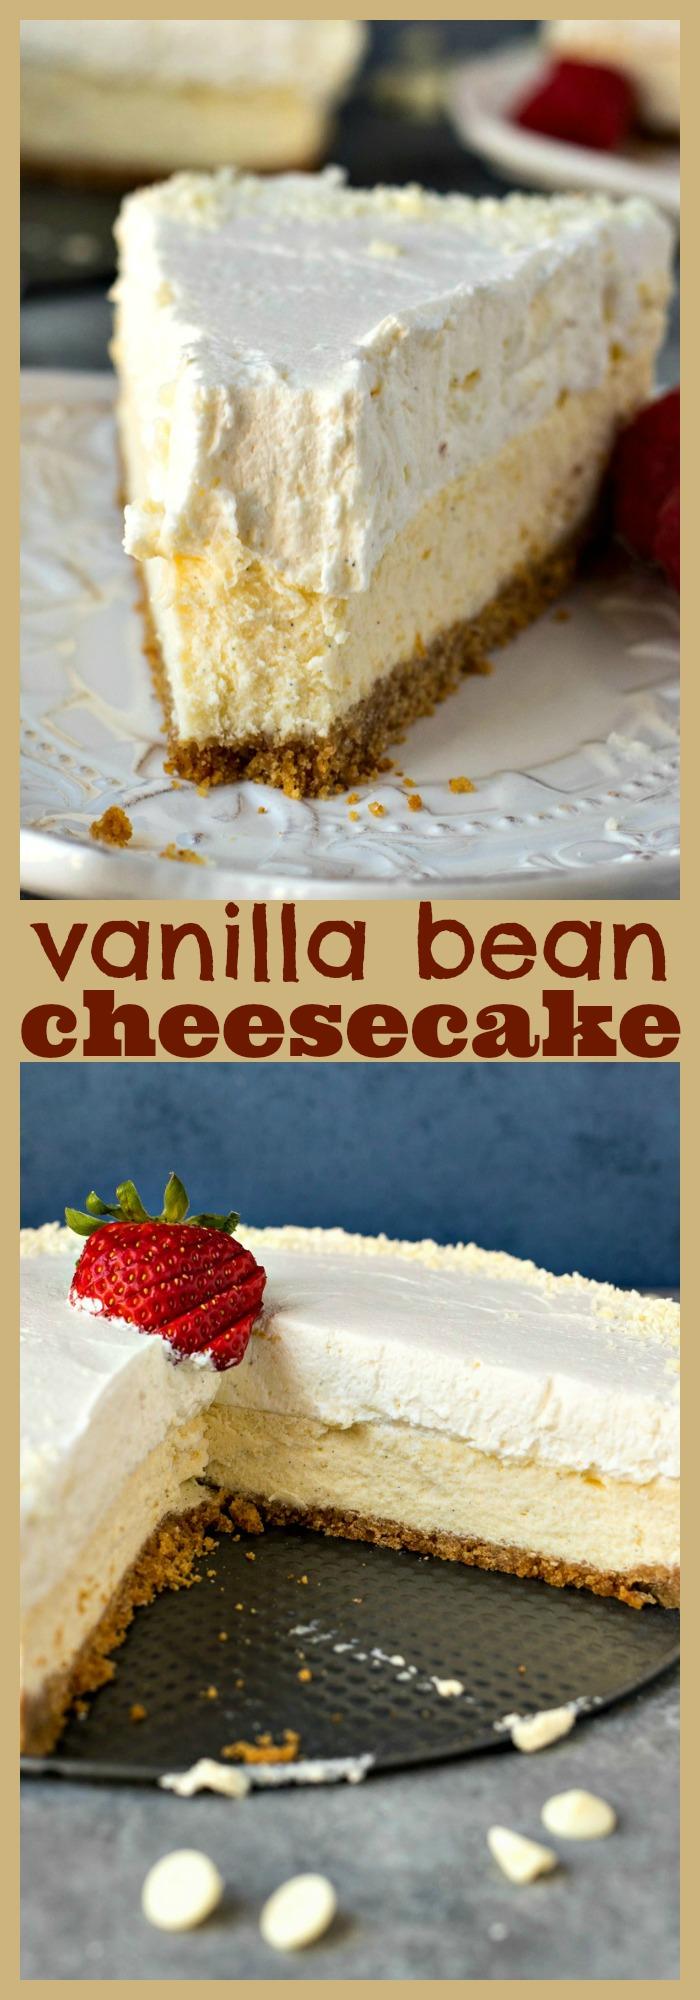 Vanilla Bean Cheesecake photo collage